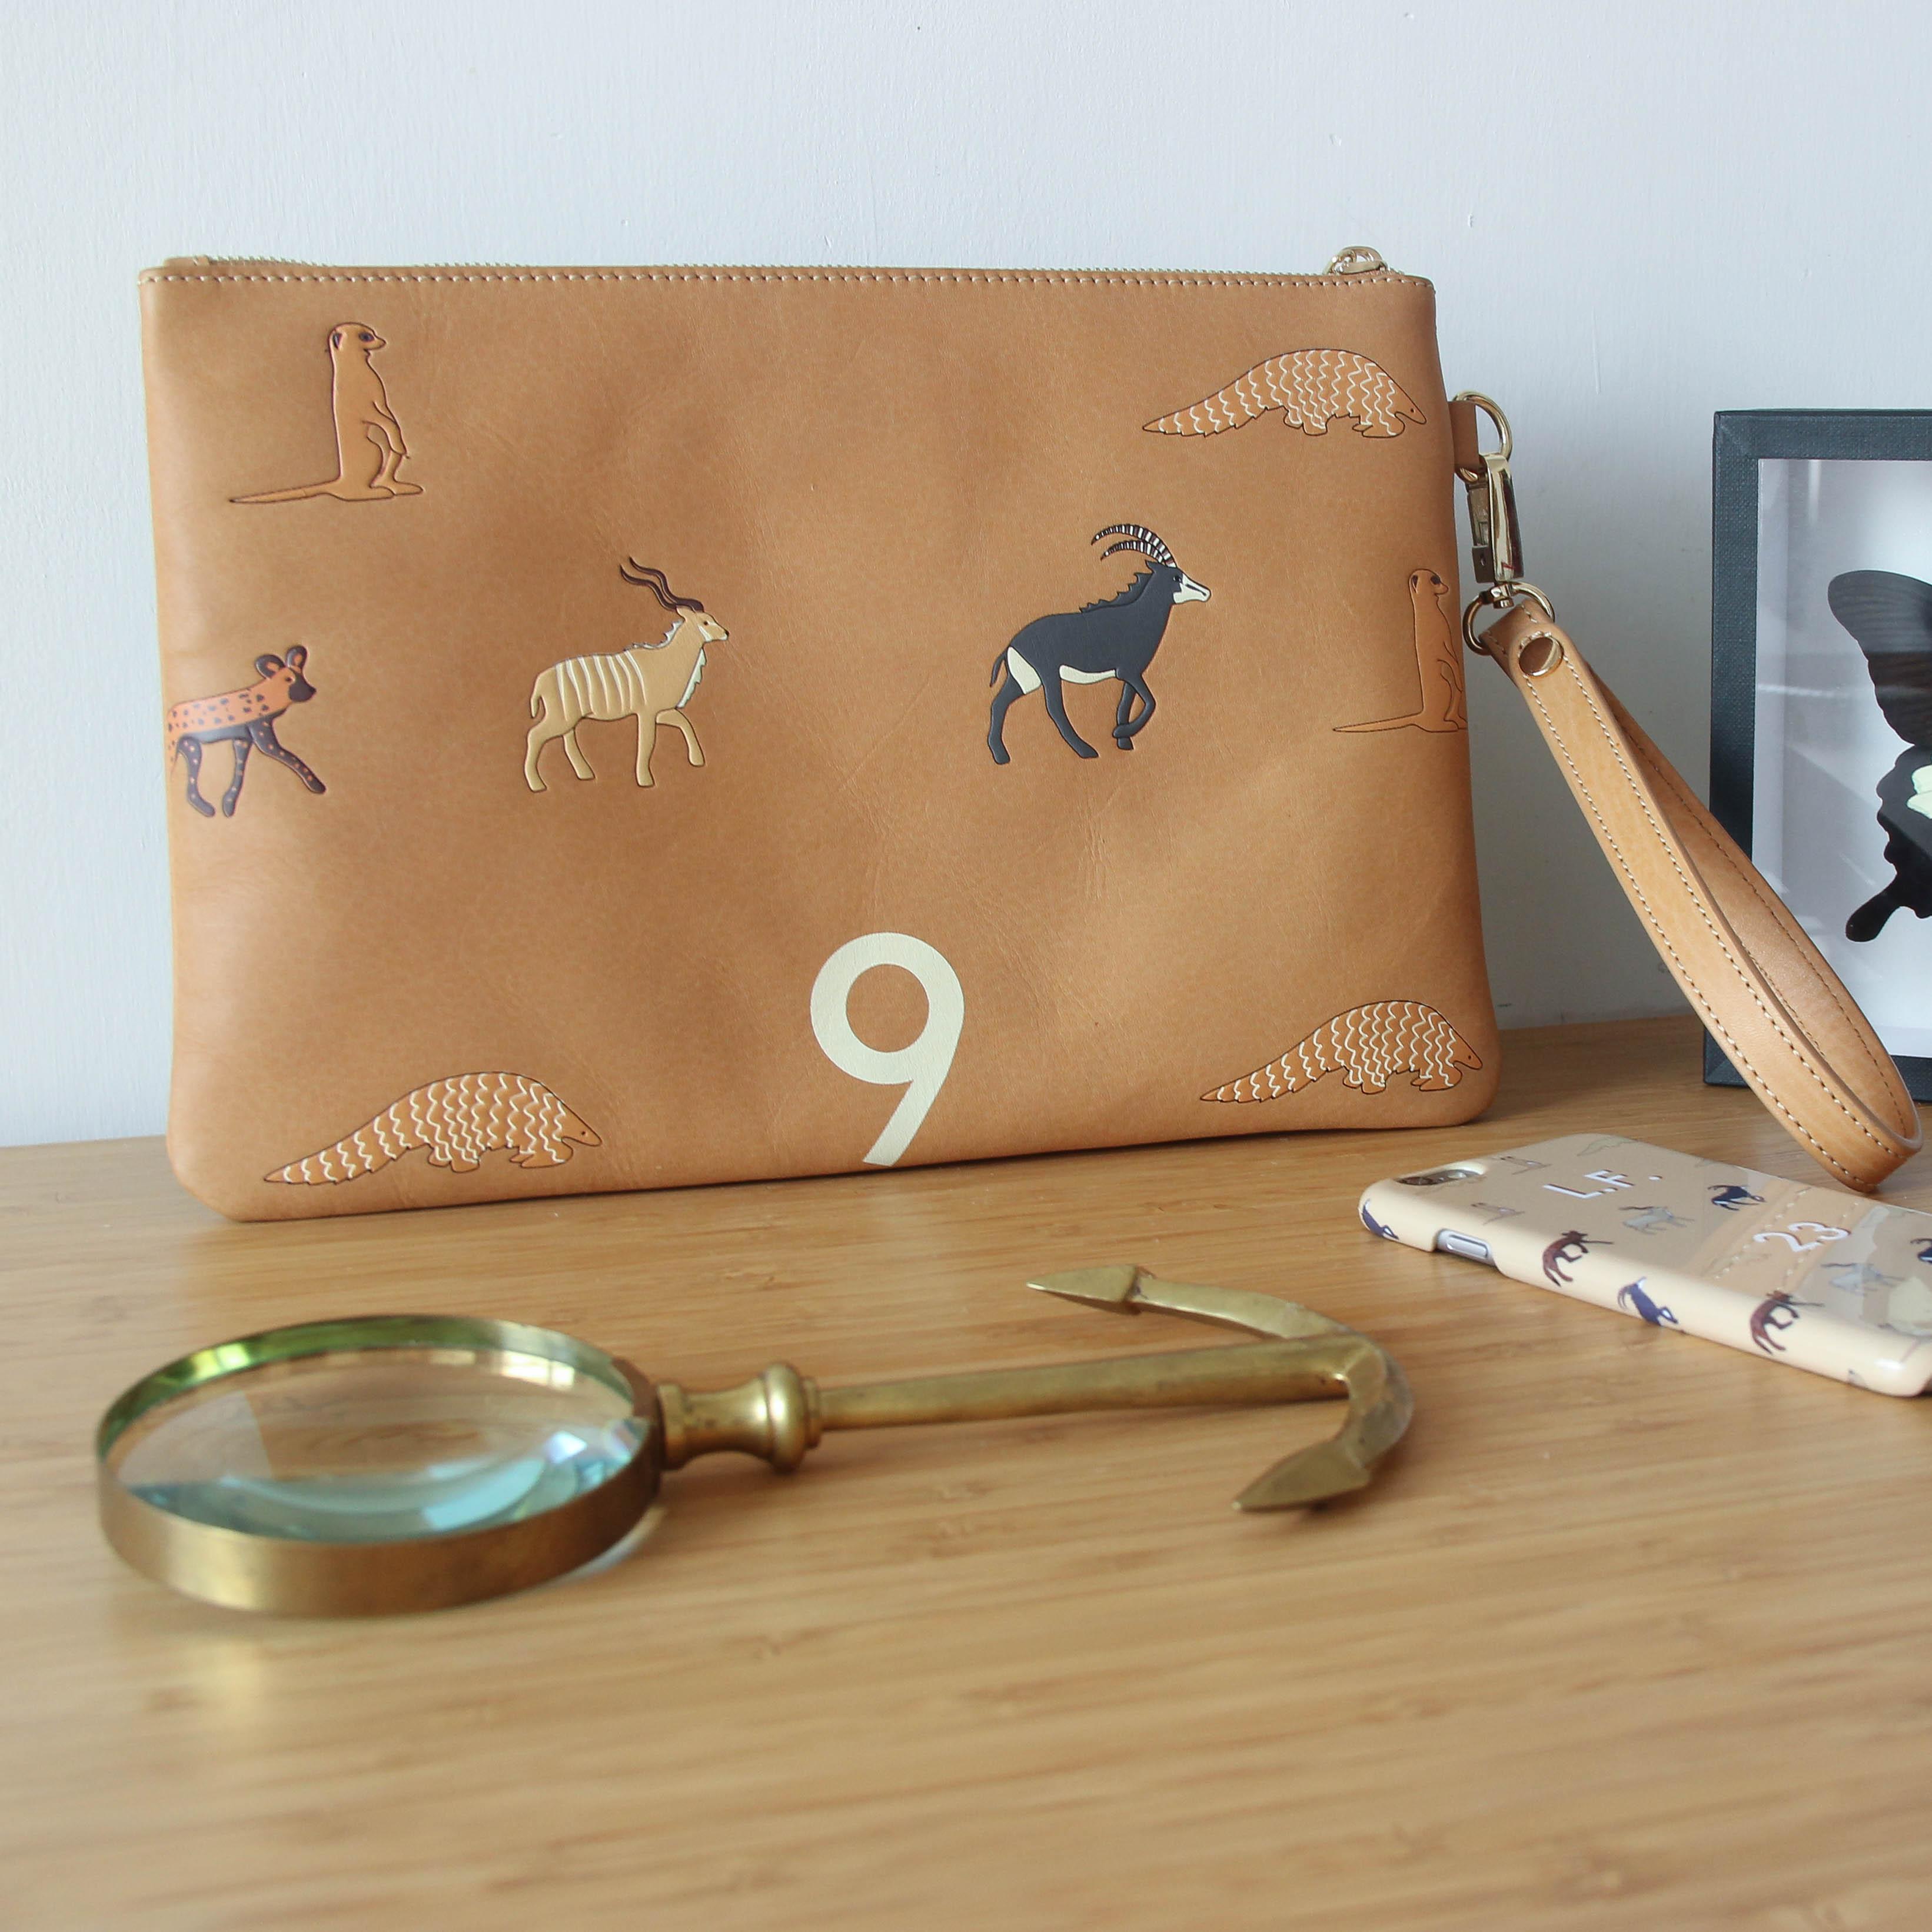 Savanna Bag Number 9